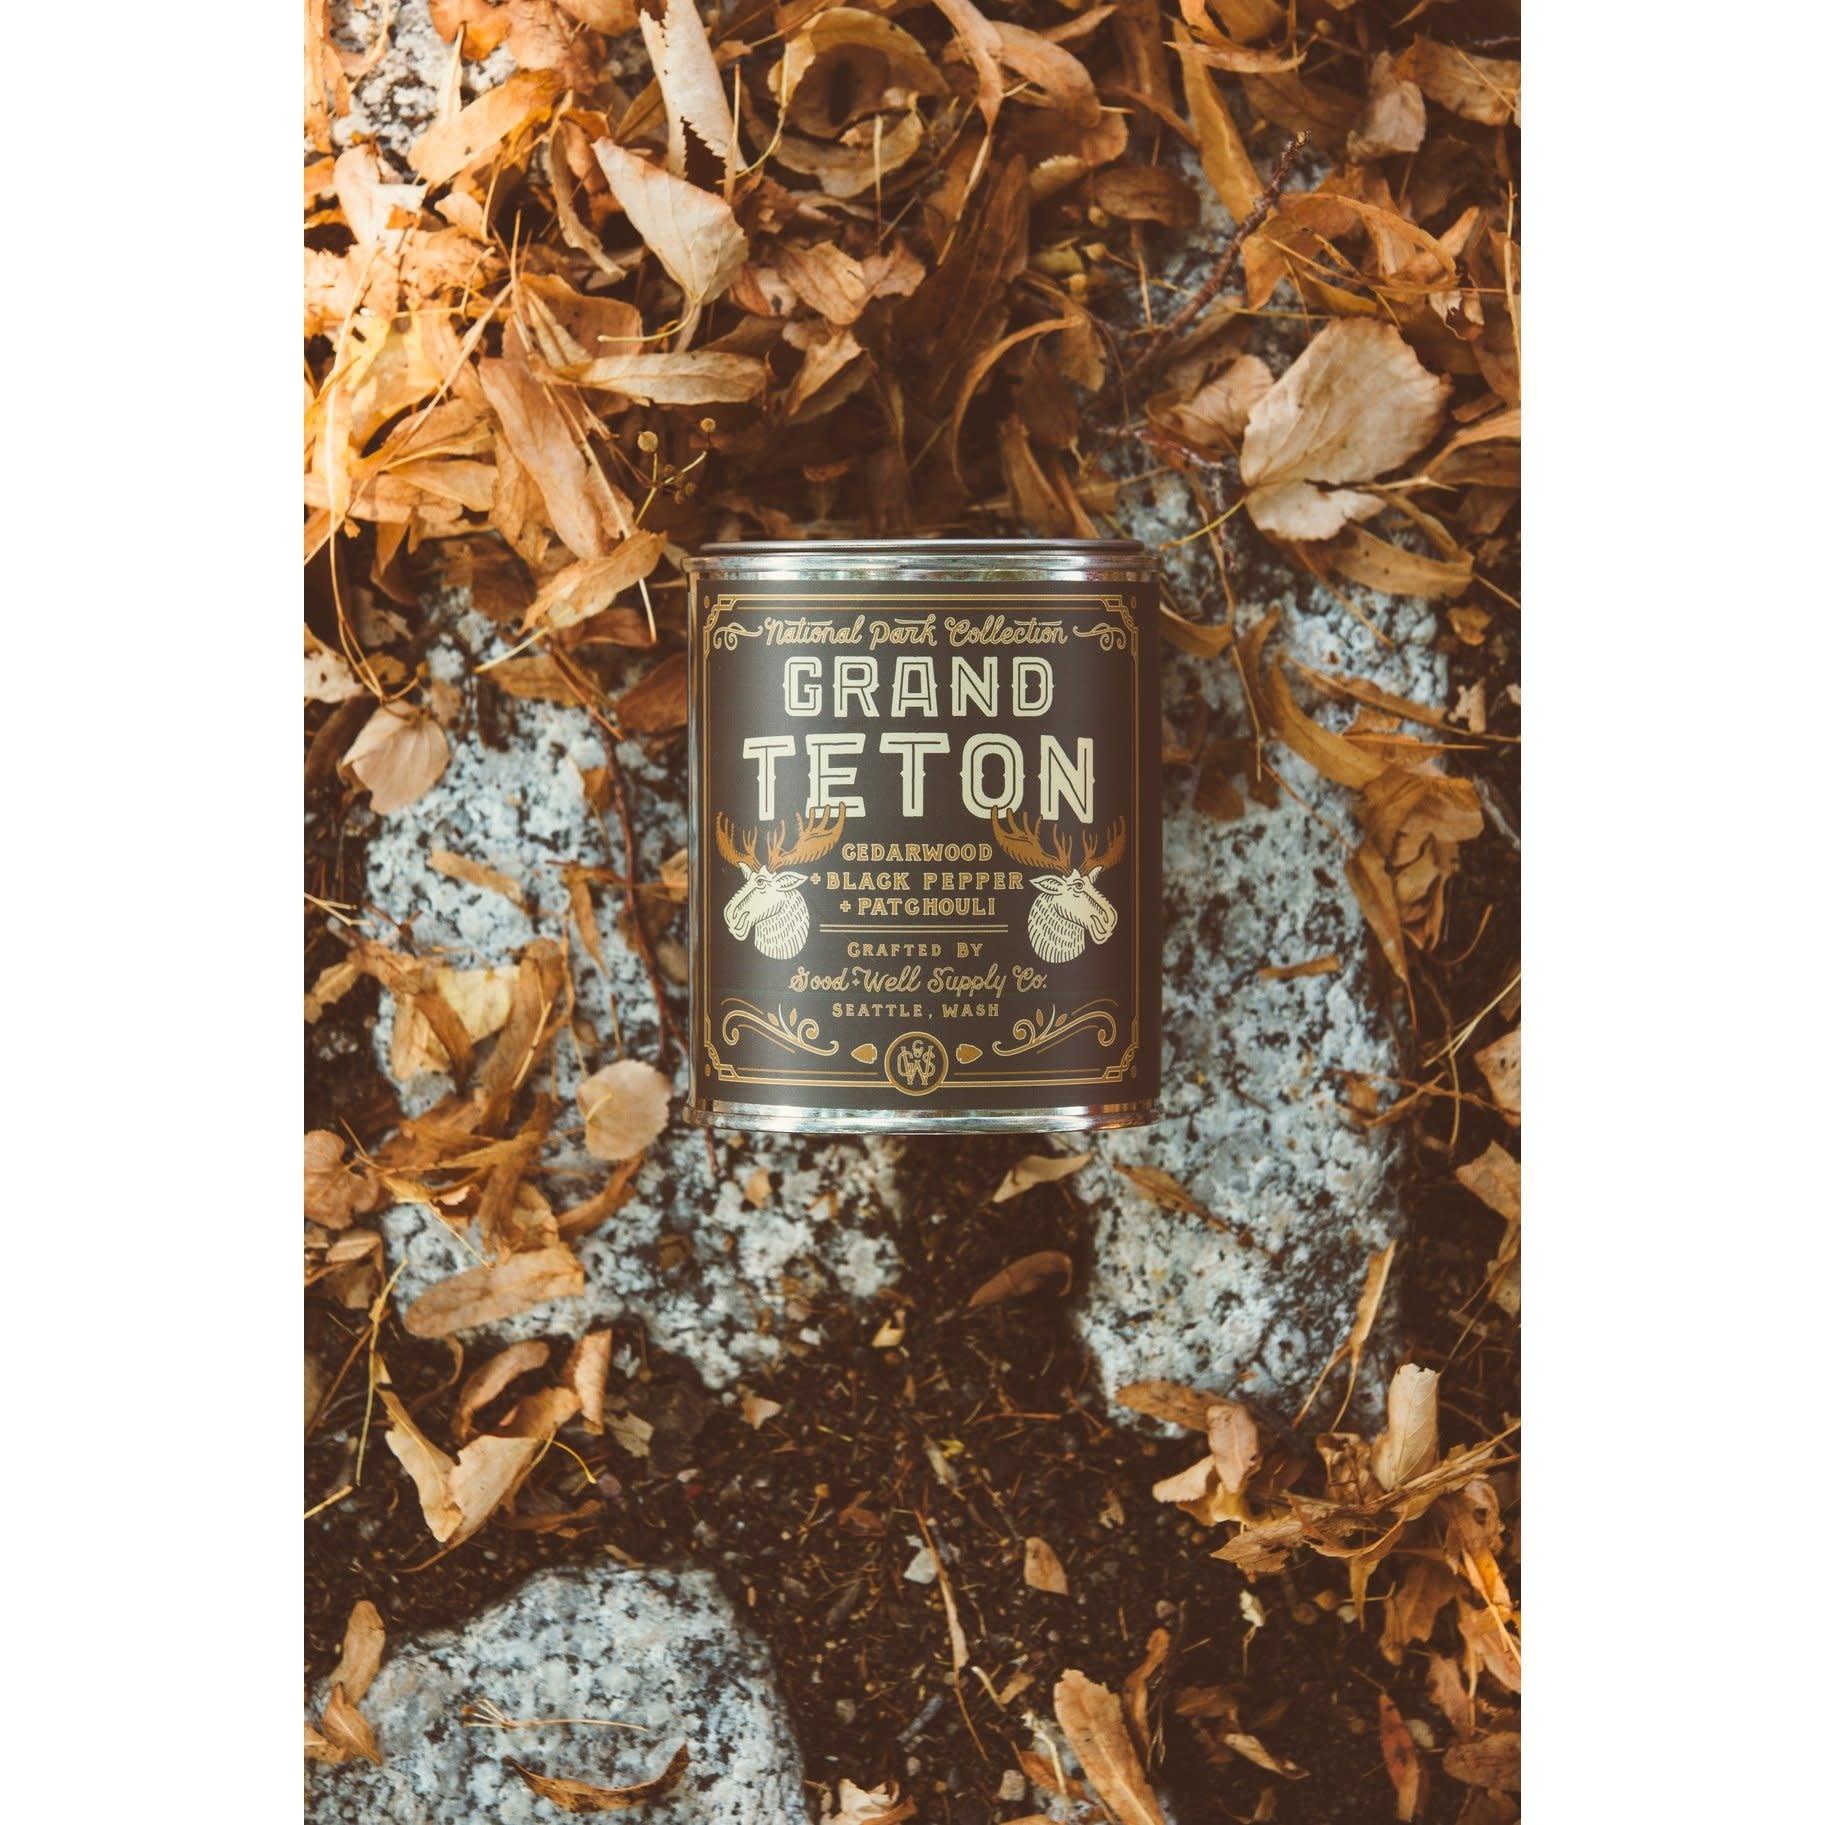 Grand Teton 1/2 Pint Candle